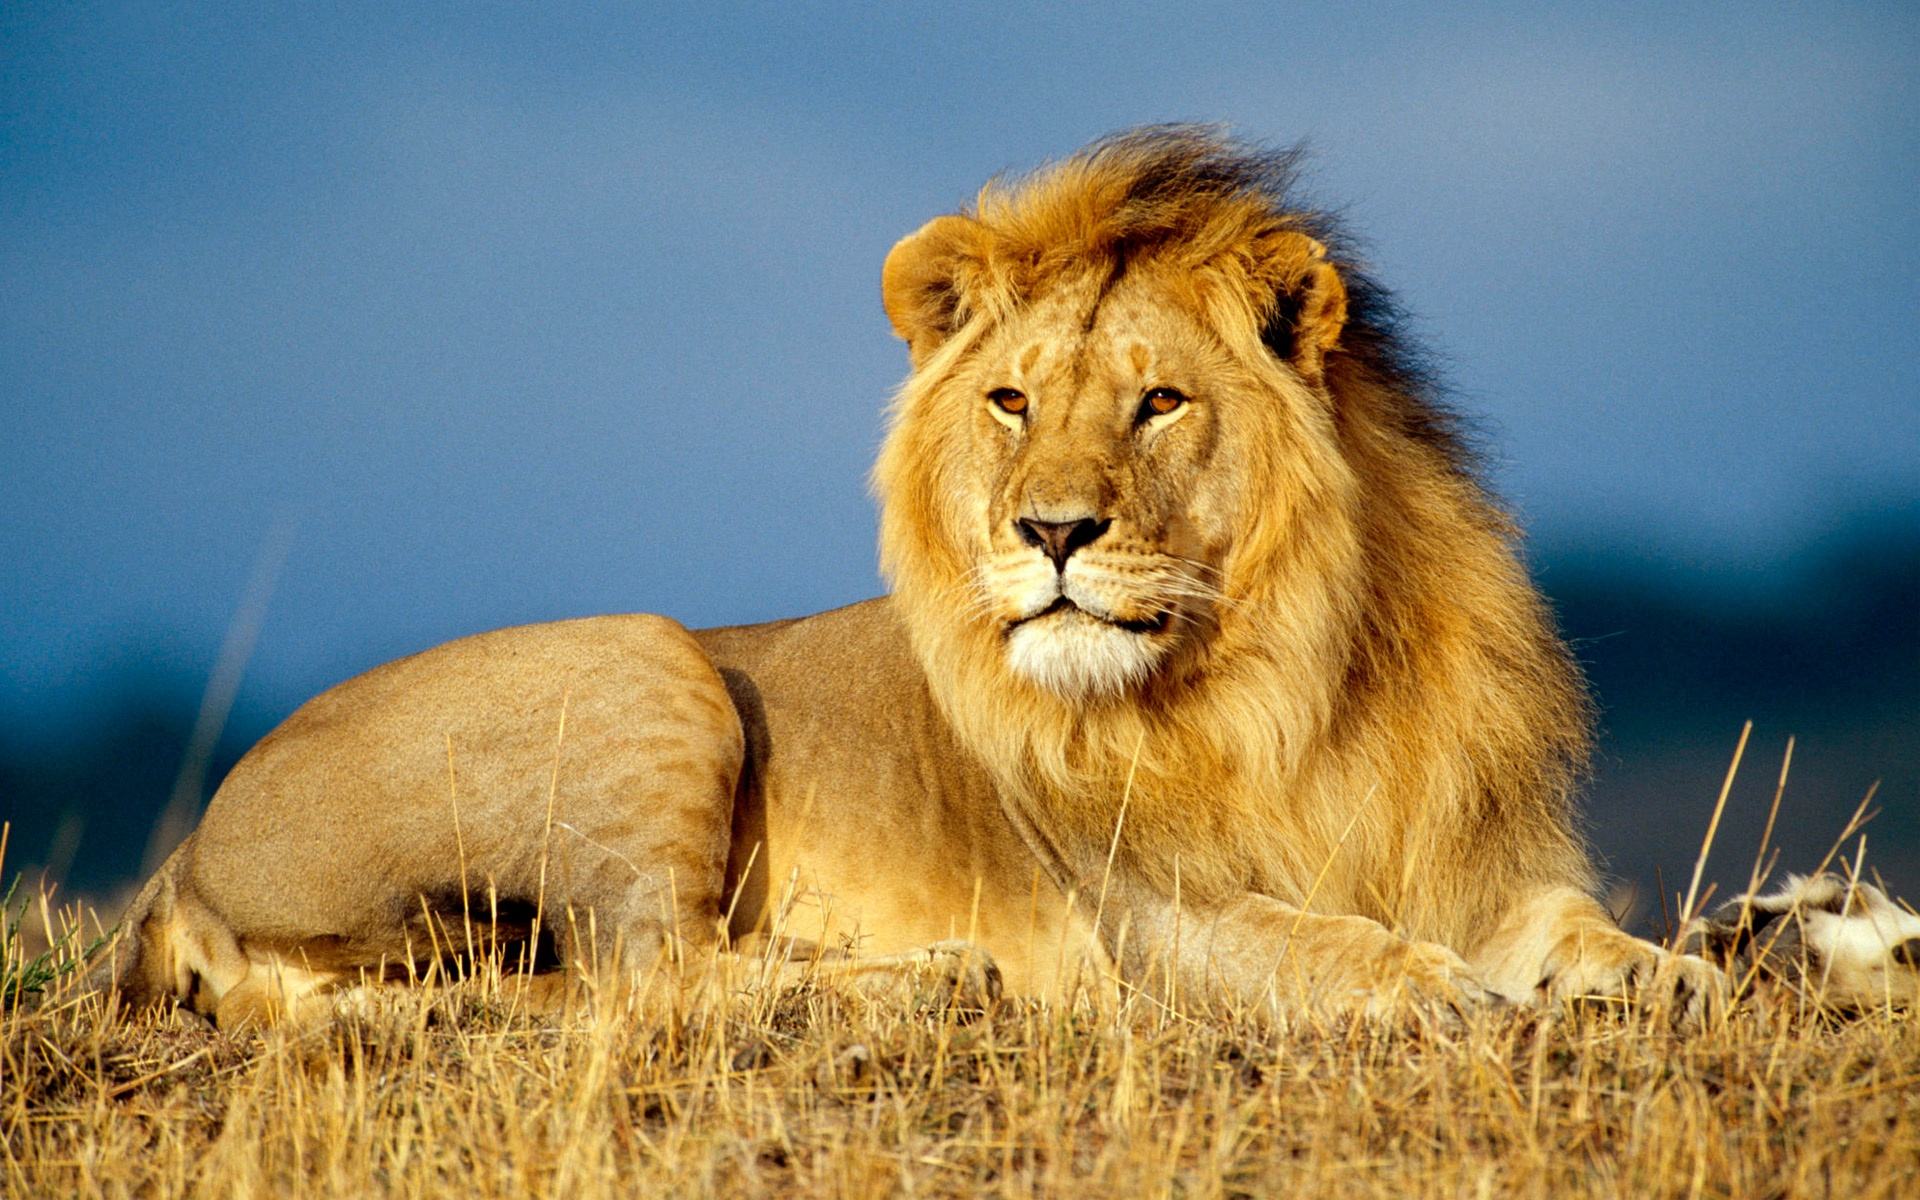 Wallpaper download lion - African Lion King